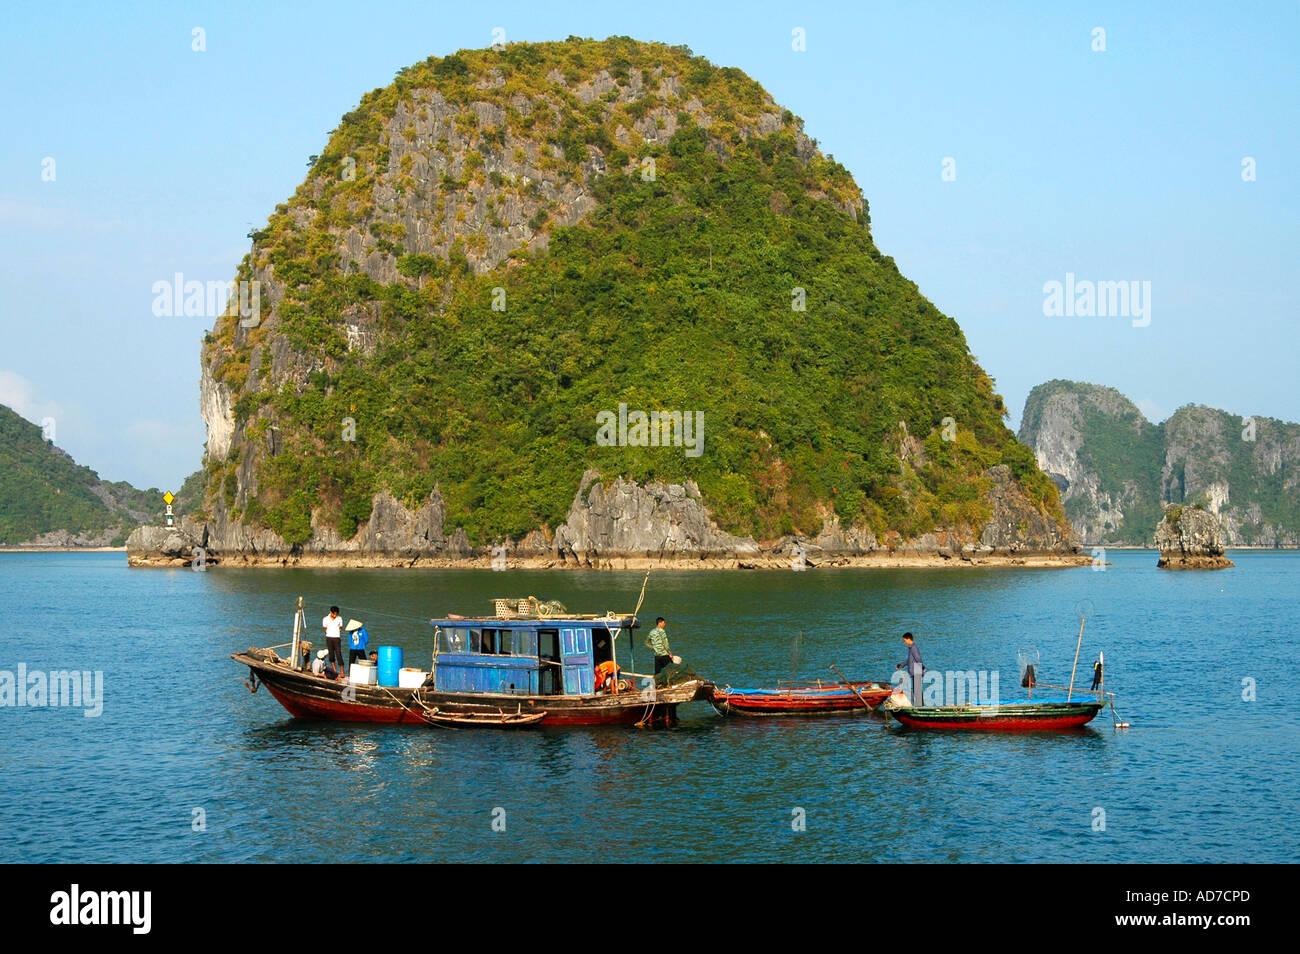 Fisher men fishing in Halong Bay Viet Nam - Stock Image